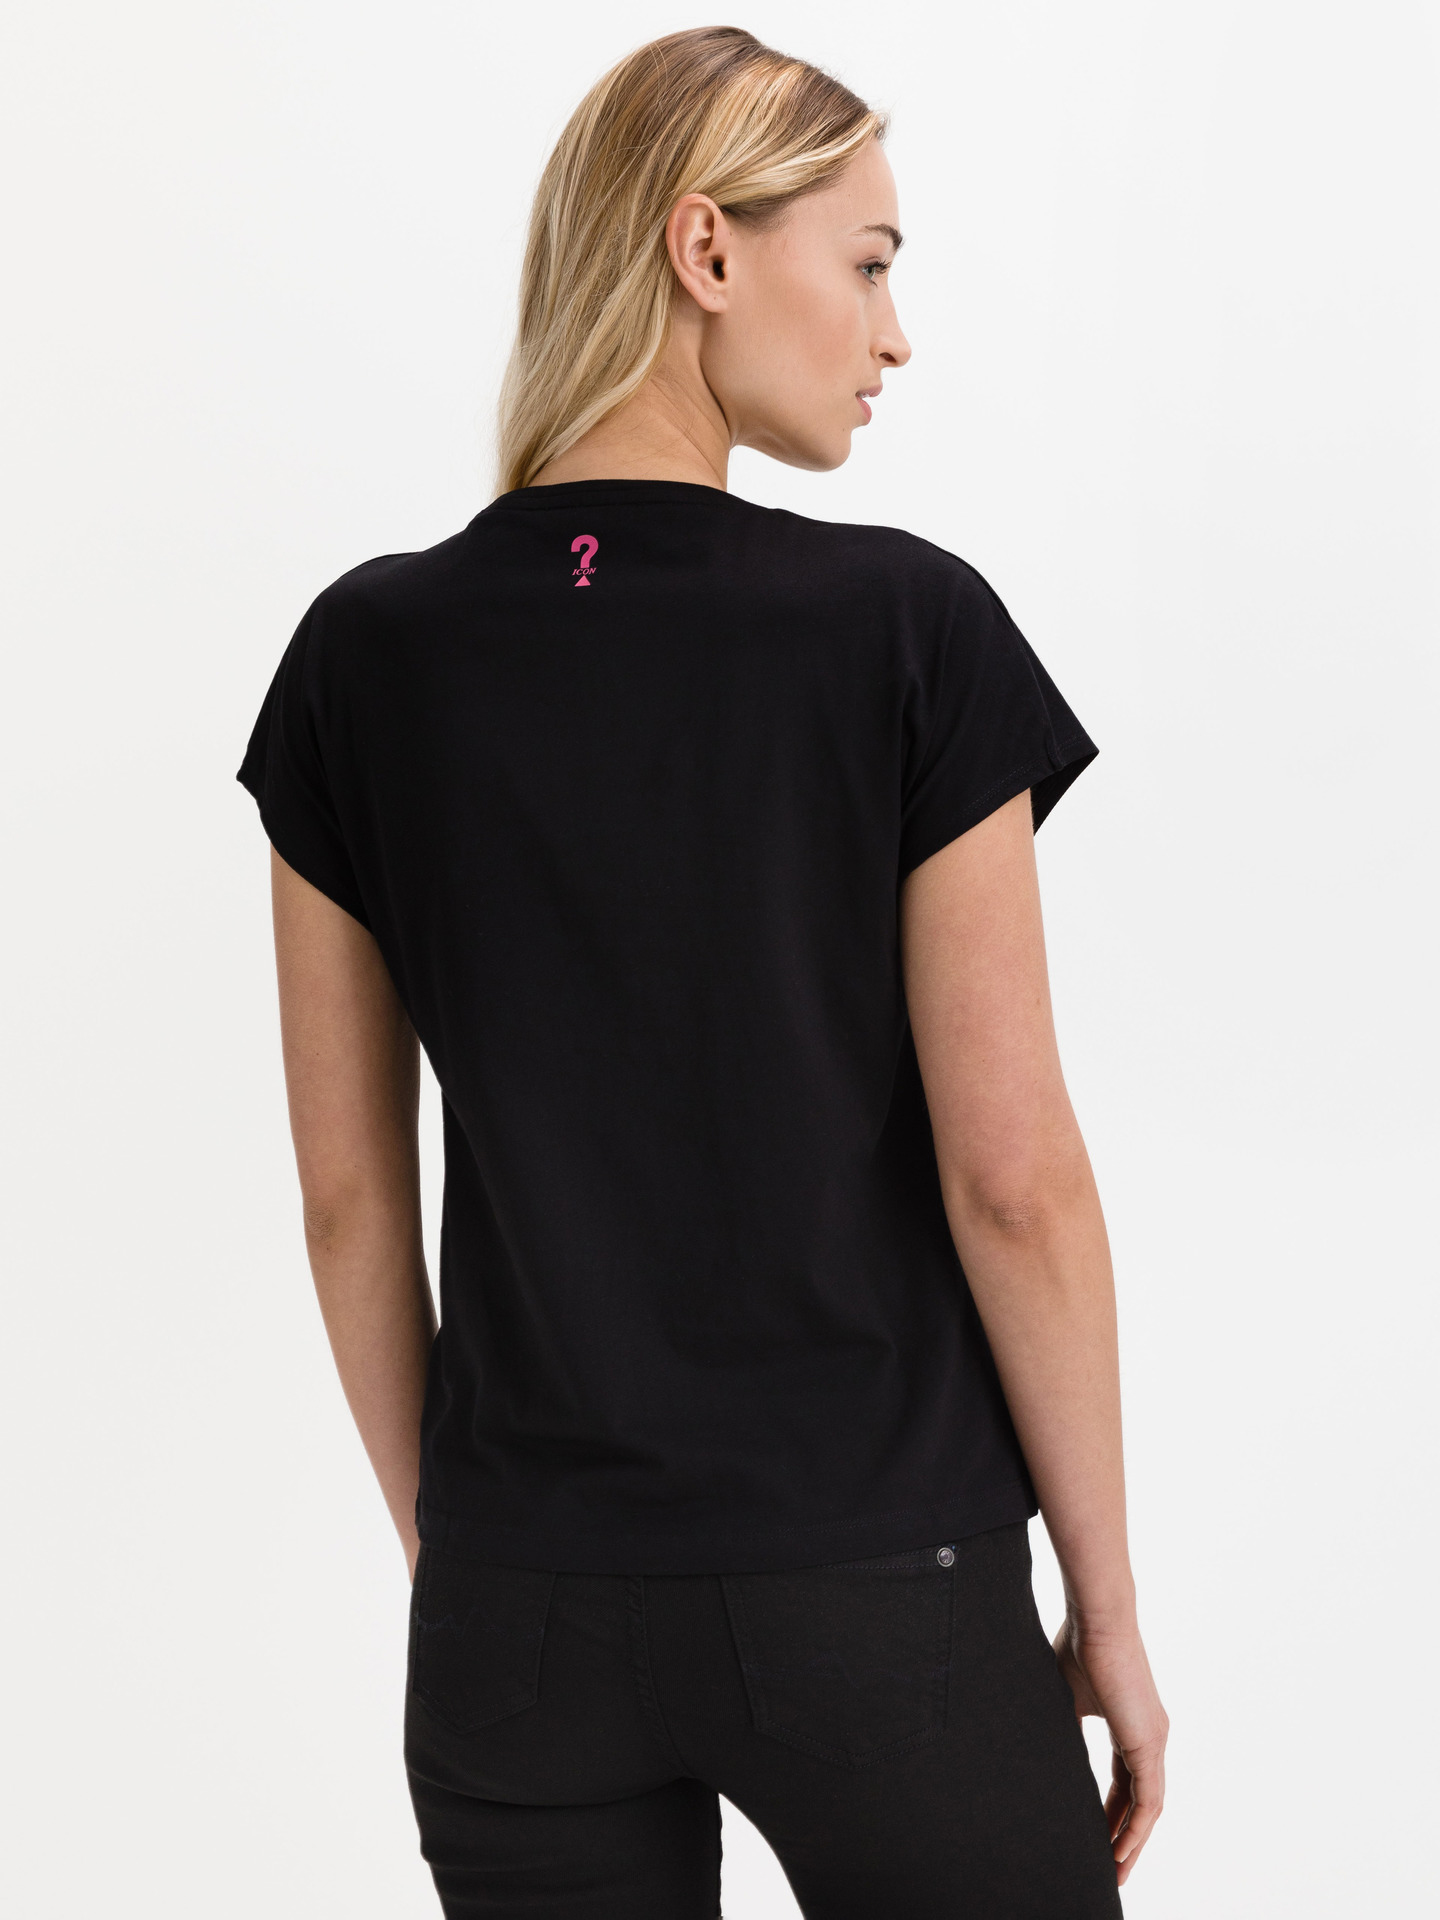 Guess black T-shirt Tonya